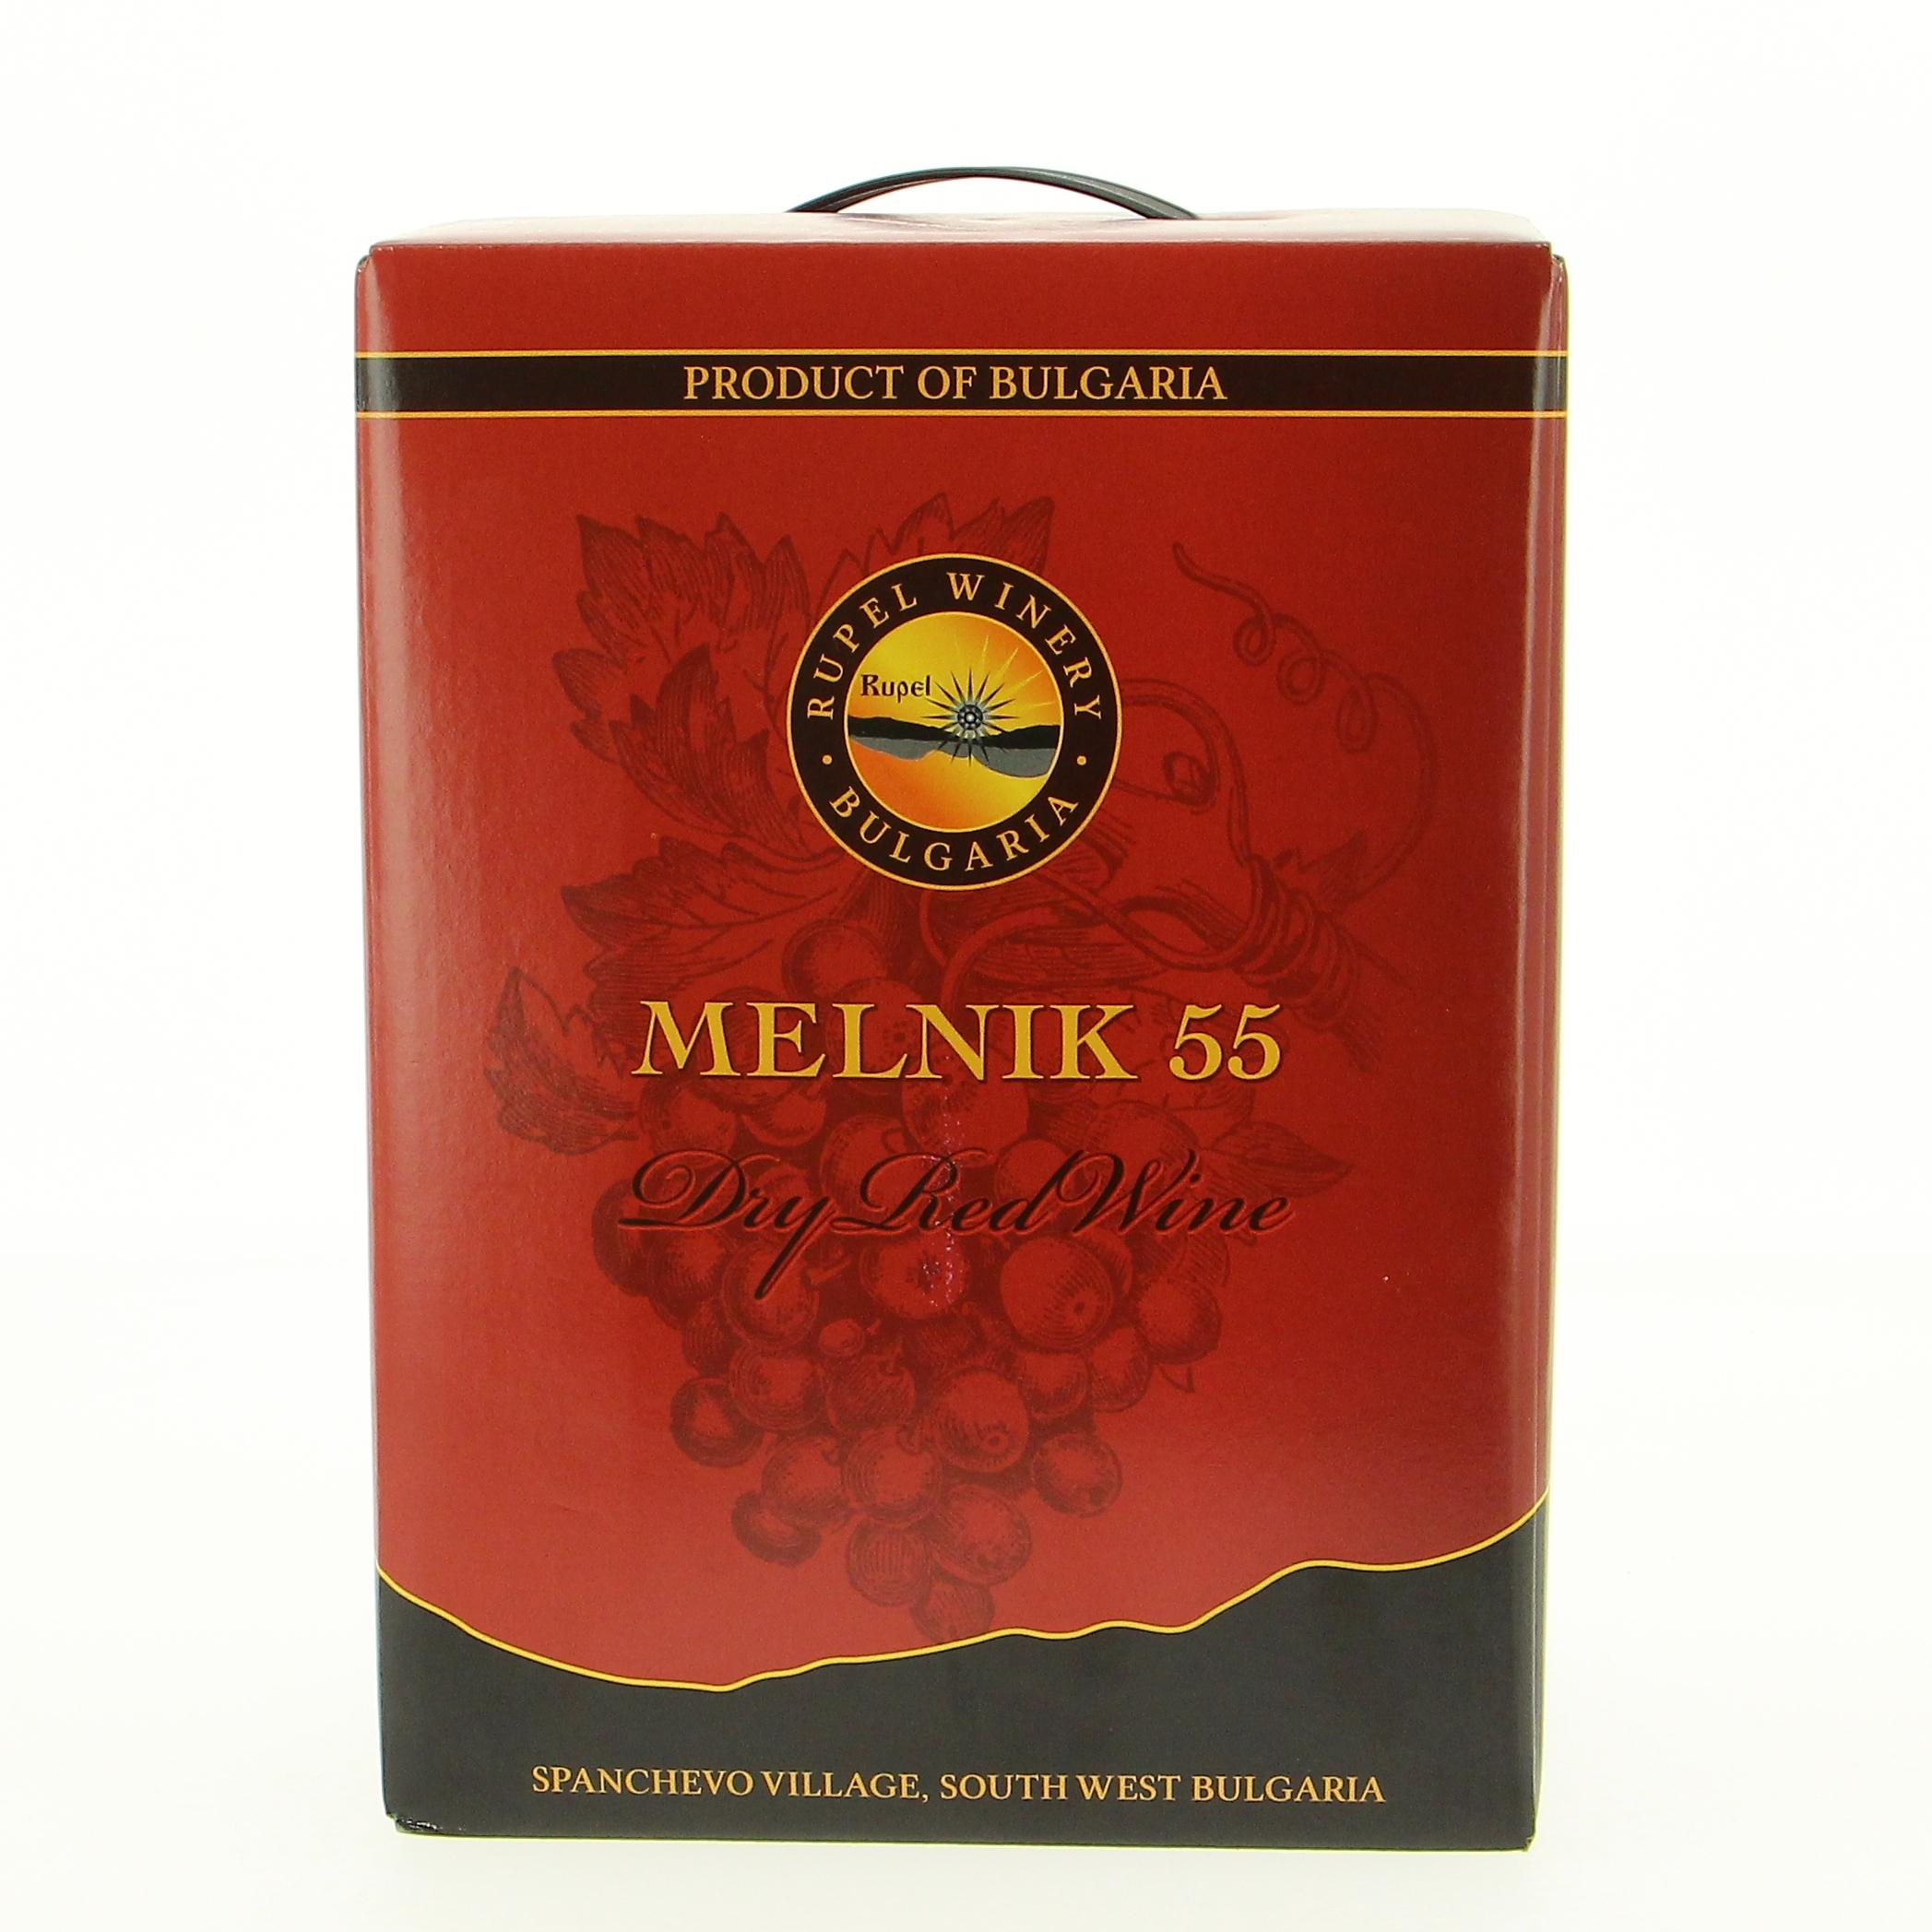 Melnik 55 box